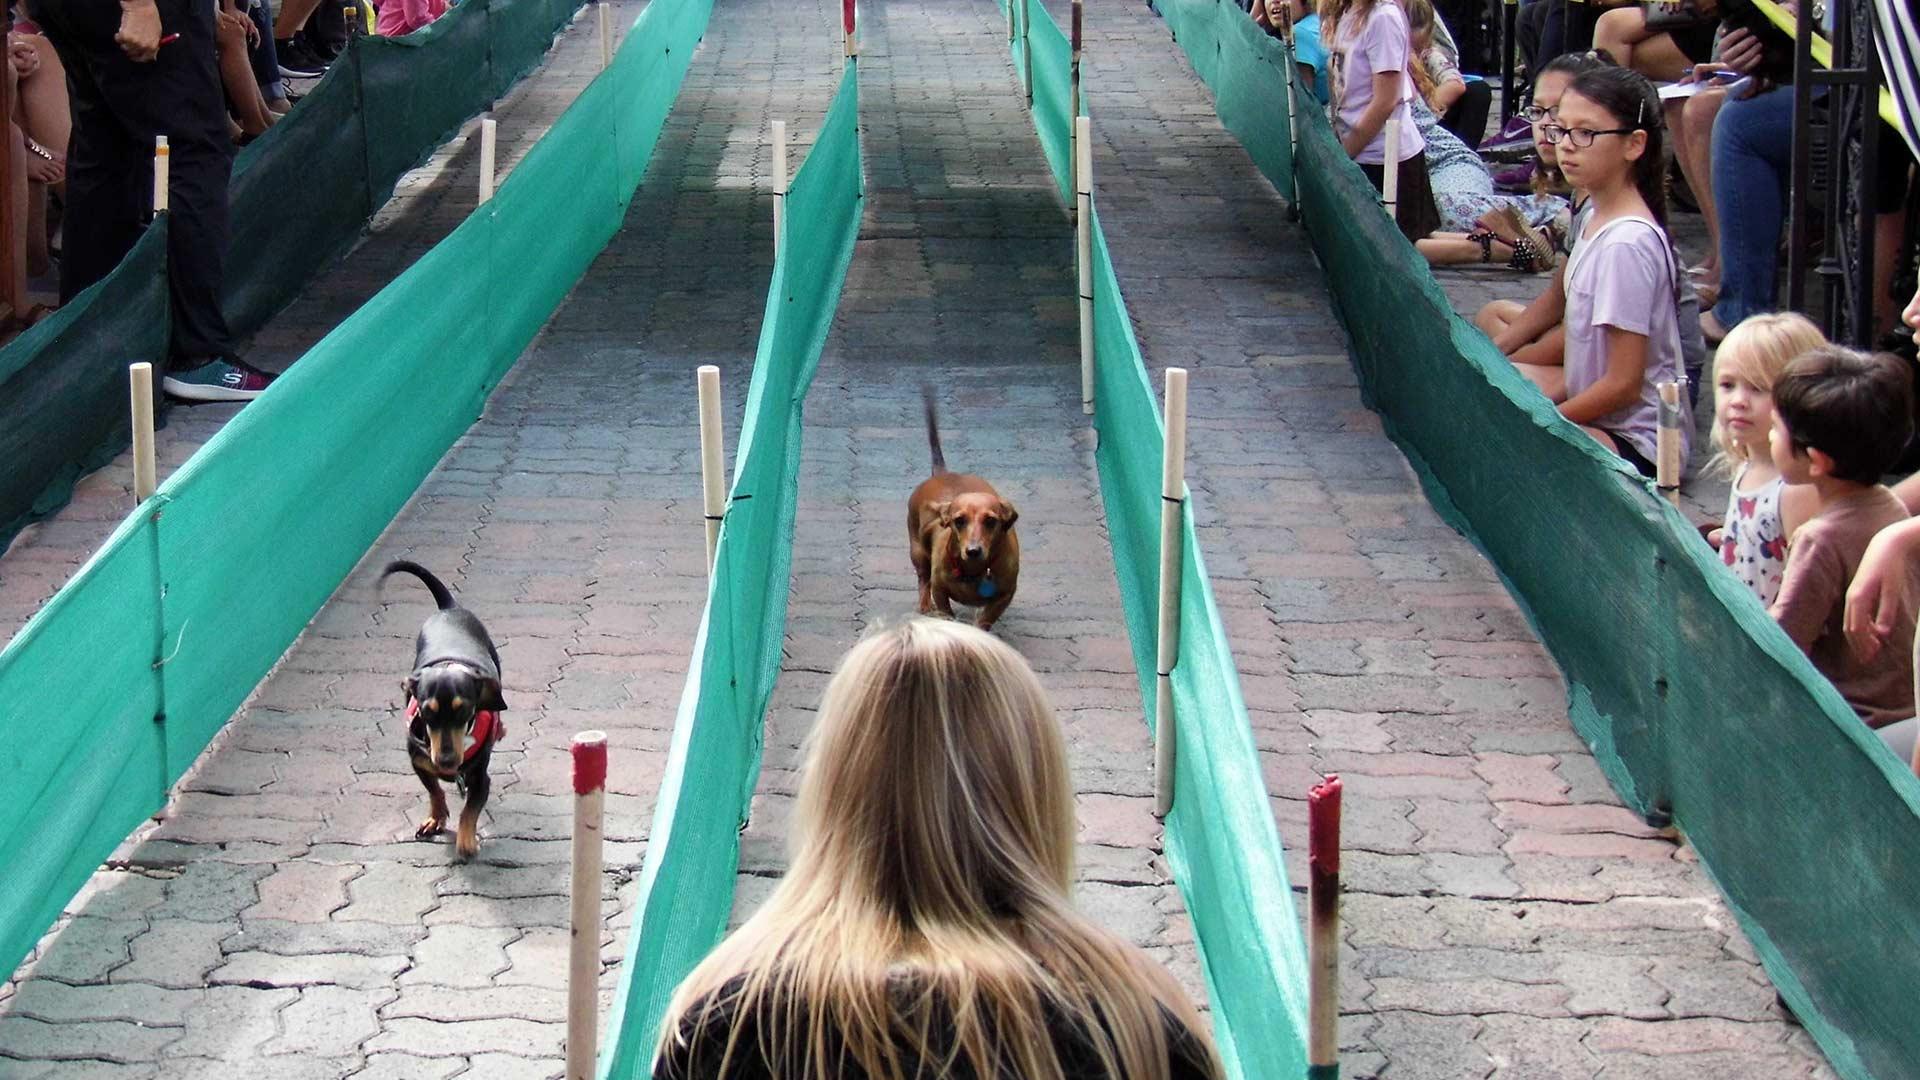 Dachshunds run down a racing lane at a wiener dog race